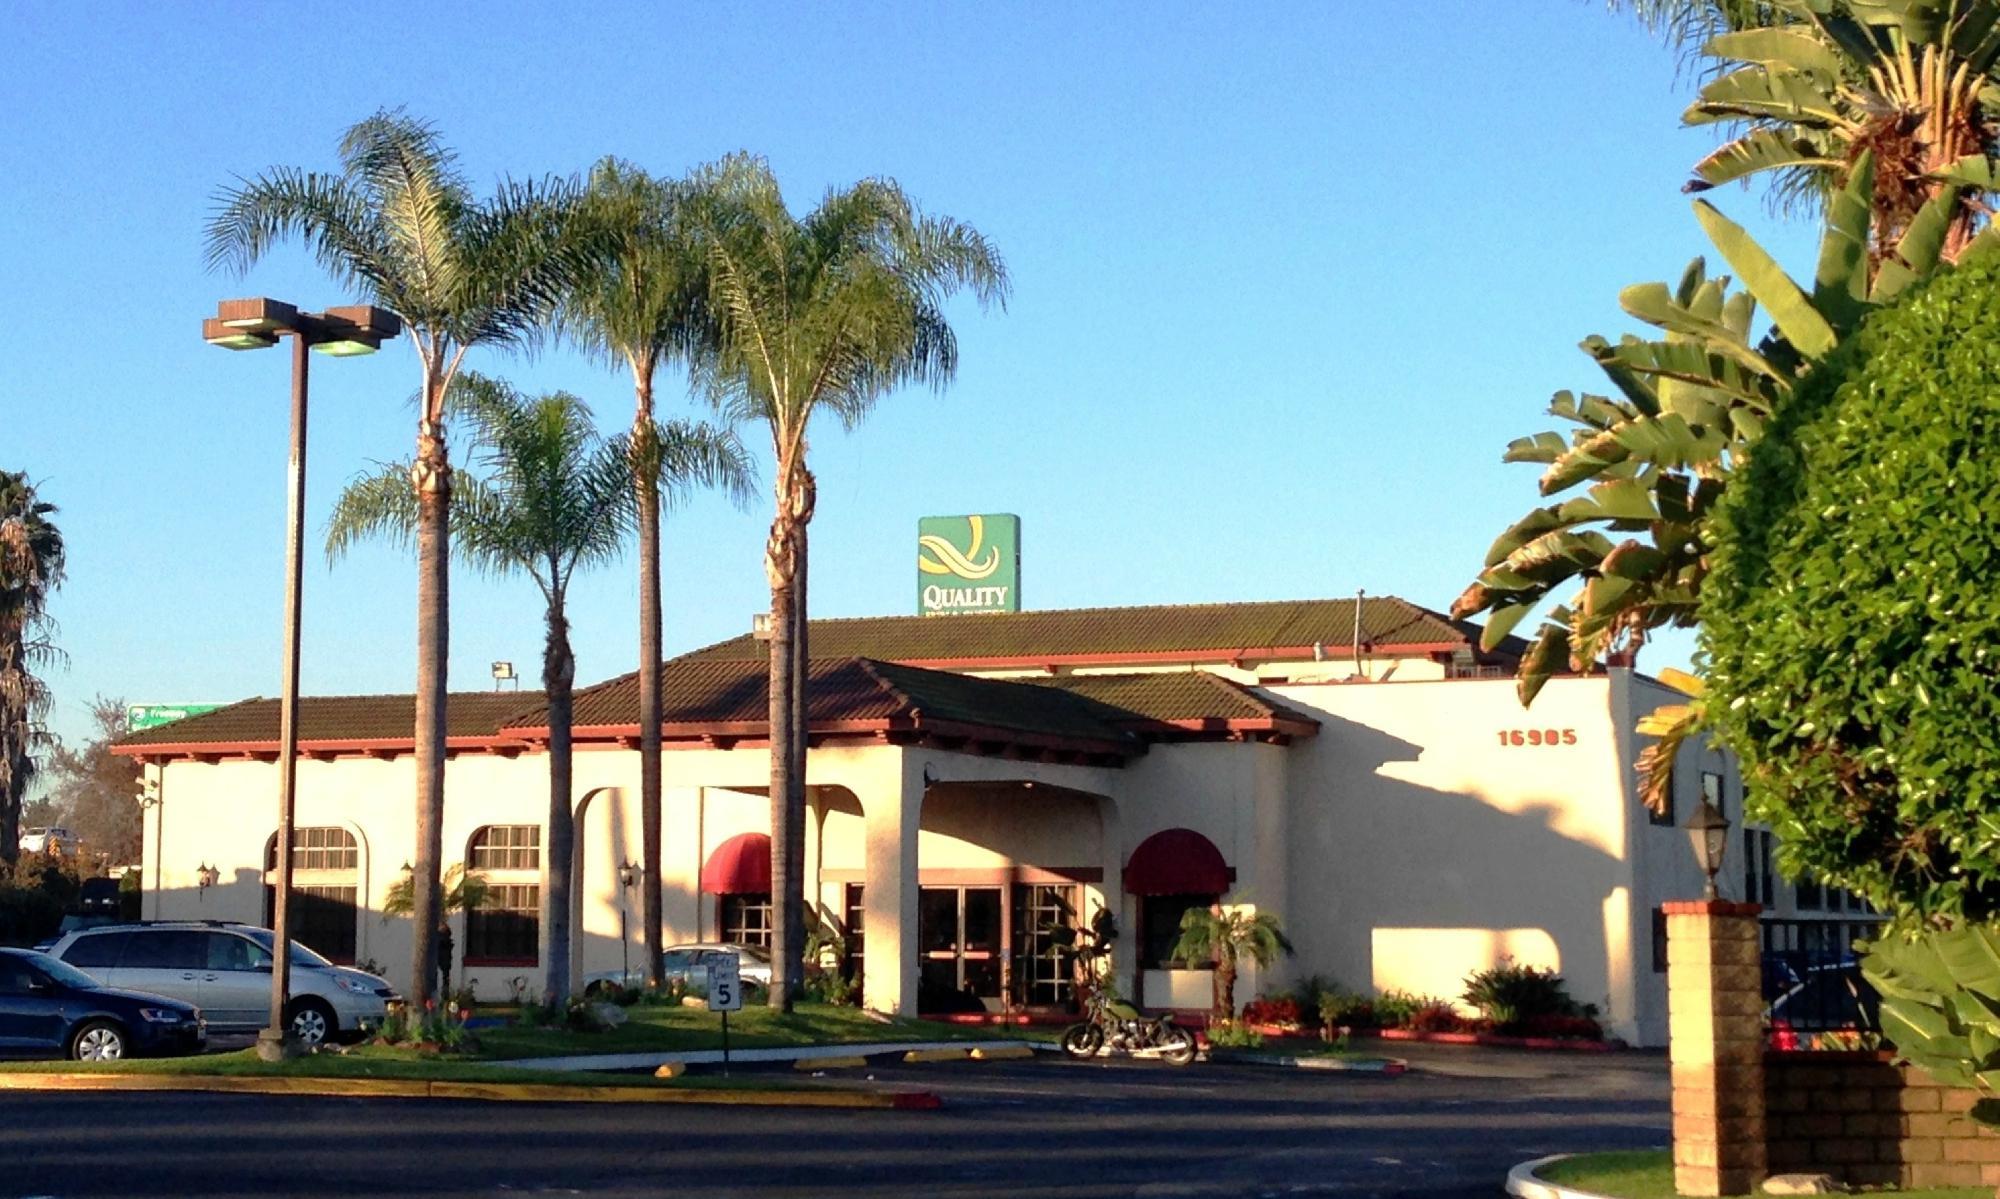 Quality Inn Artesia